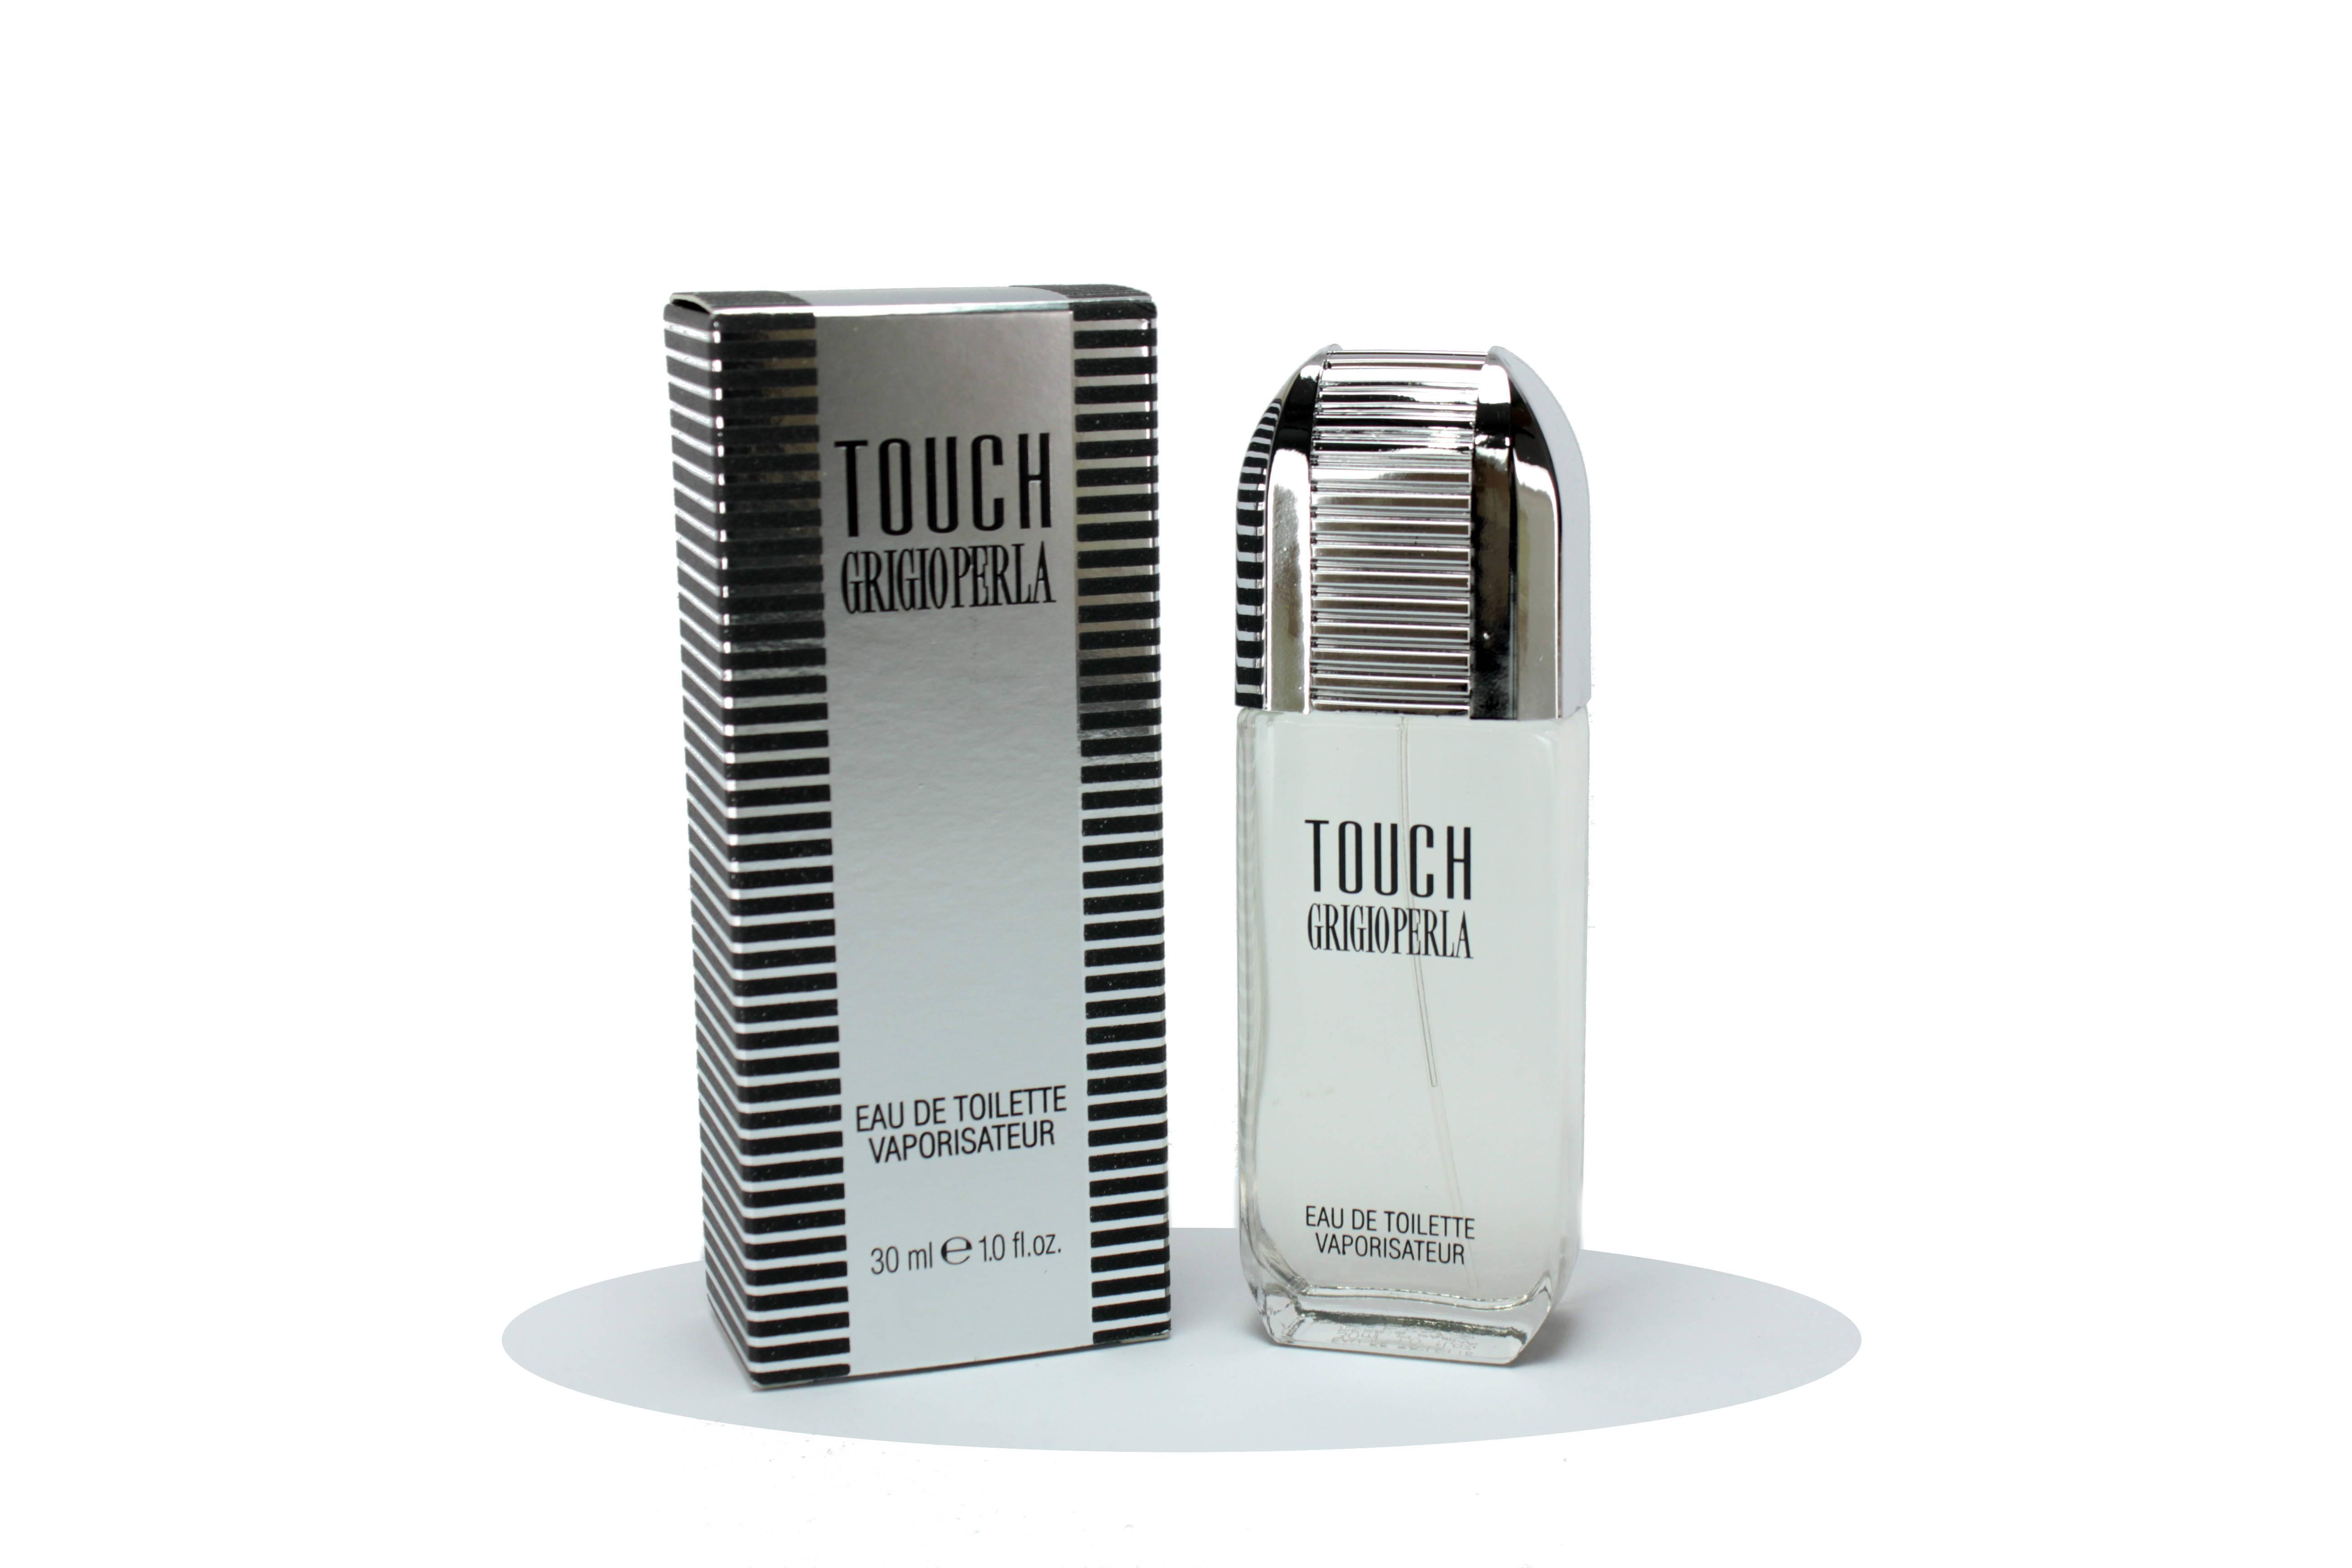 GRIGIOPERLA TOUCH EDT PROFUMO UOMO 30ML VAPO Perfume for Men Spray